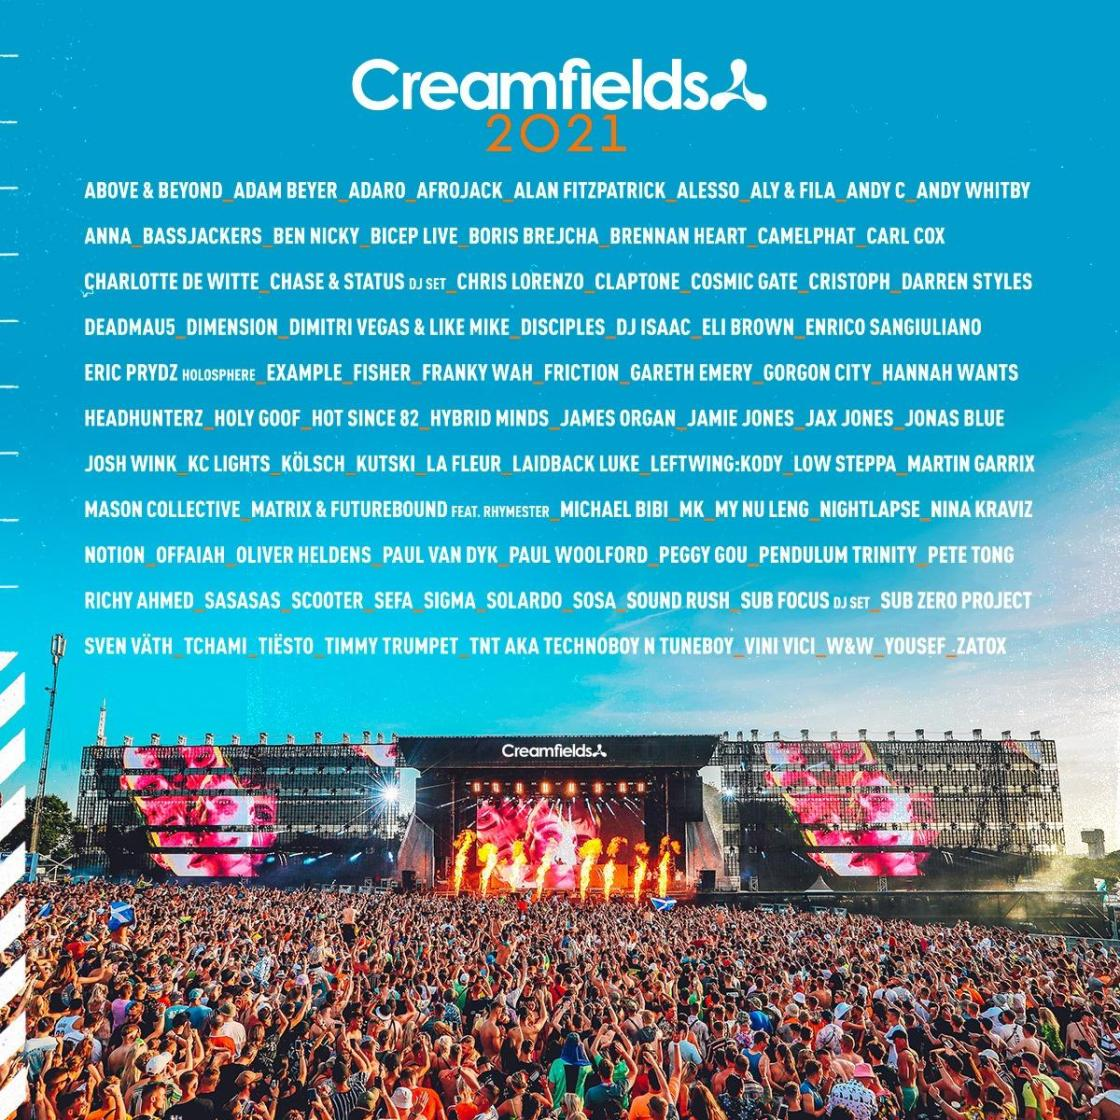 #Creamfields2021...